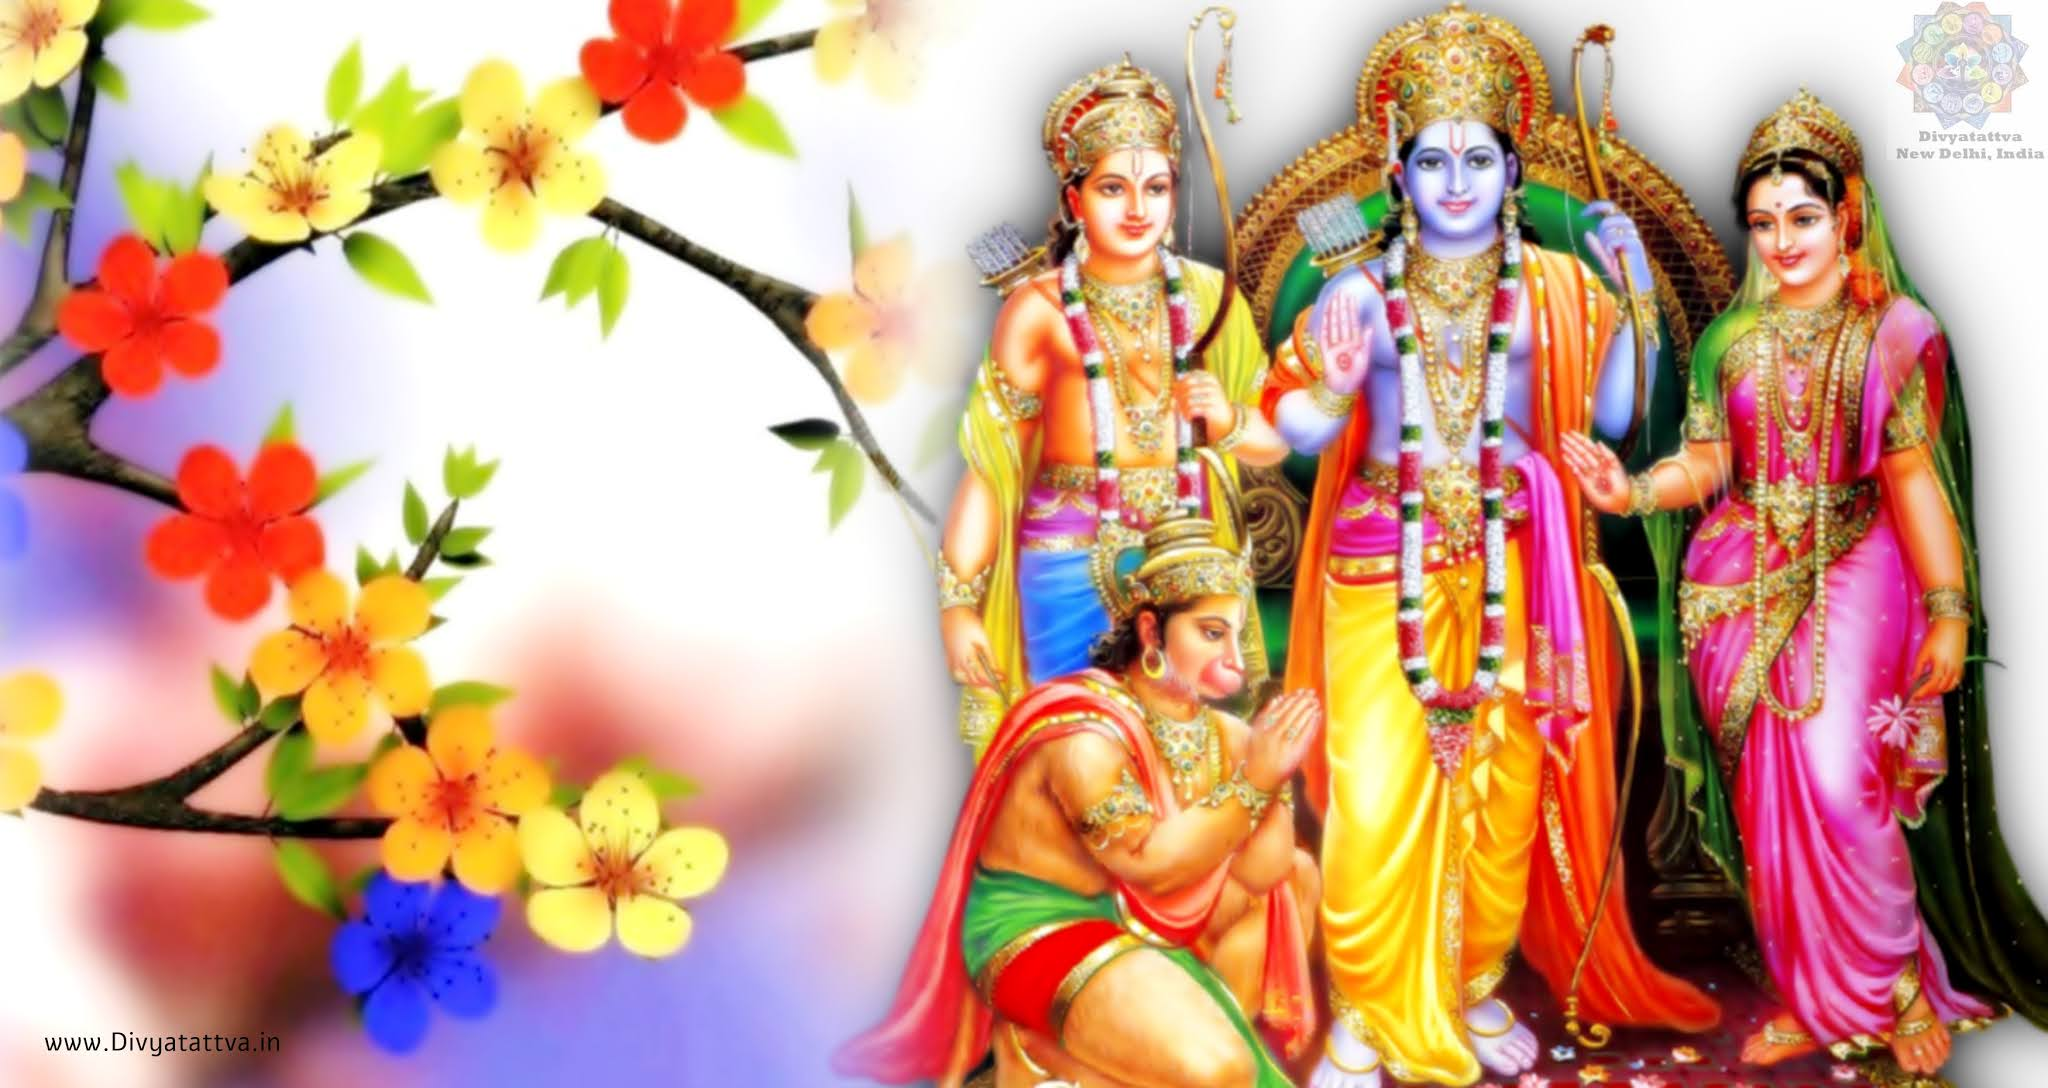 Beautiful Pictures of Lord Rama, Sita, Hanuman, Laxman or Rama Parivar Wallpapers